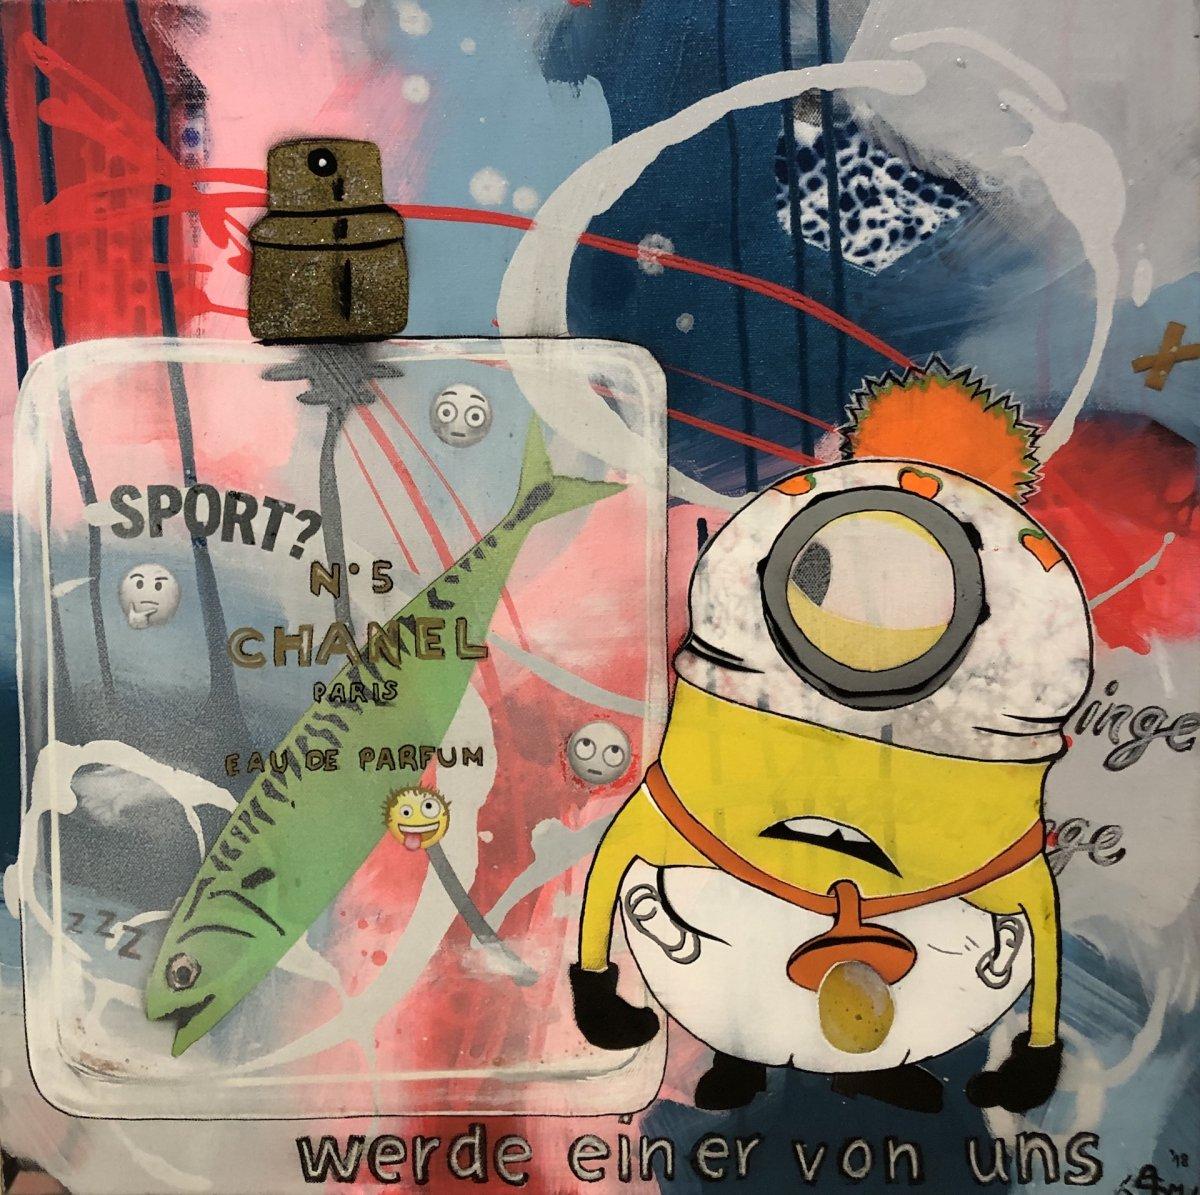 popart-streetart-urbanart-popstreet-popstreetshop-galerie-cartoon